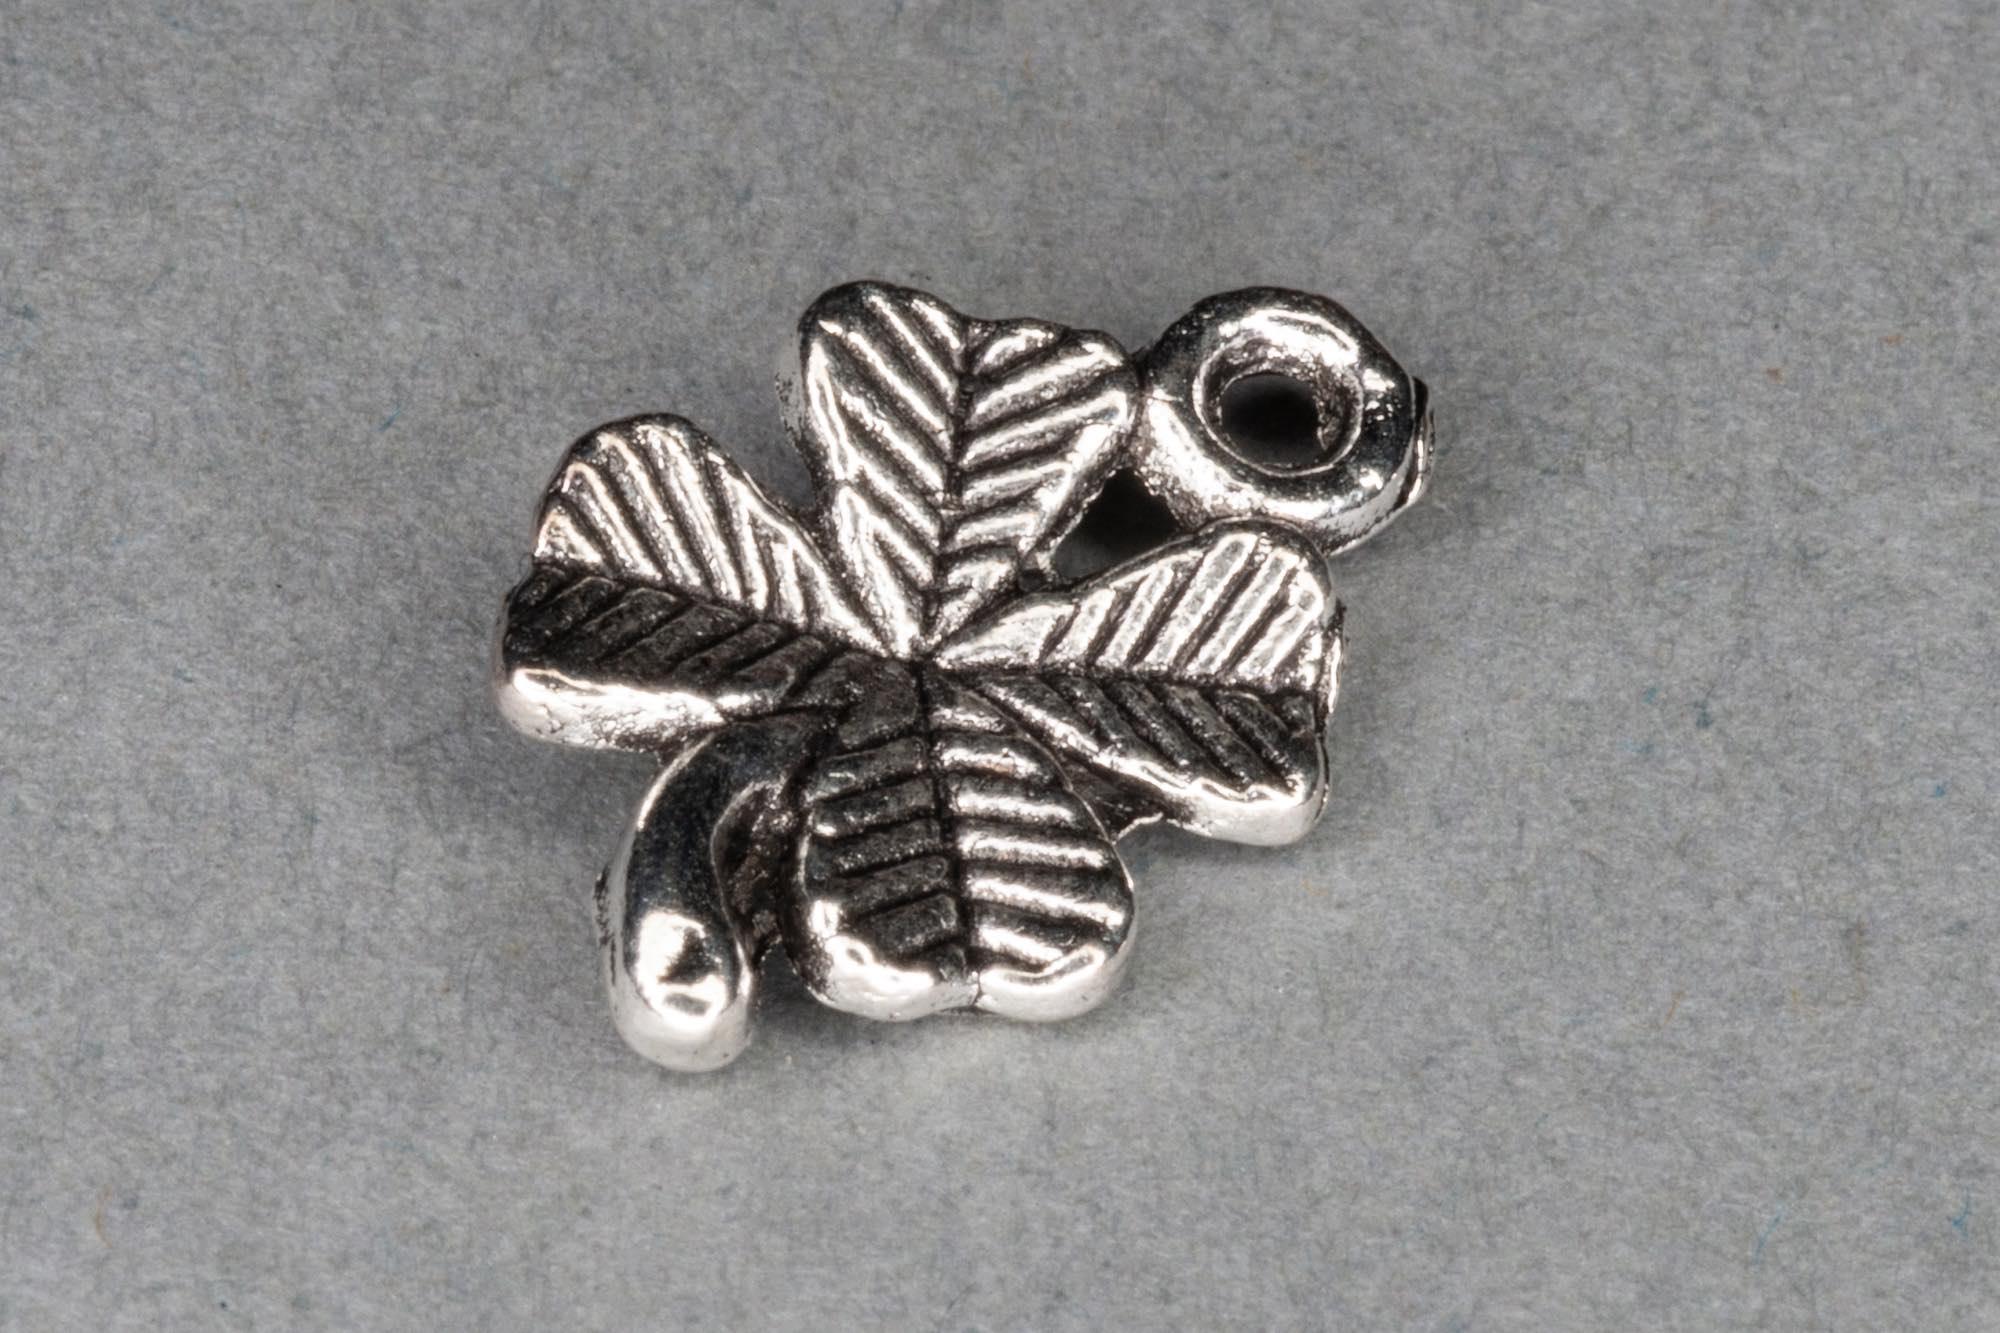 Antique Silver 4 Leaf Clover Charm 15x10mm